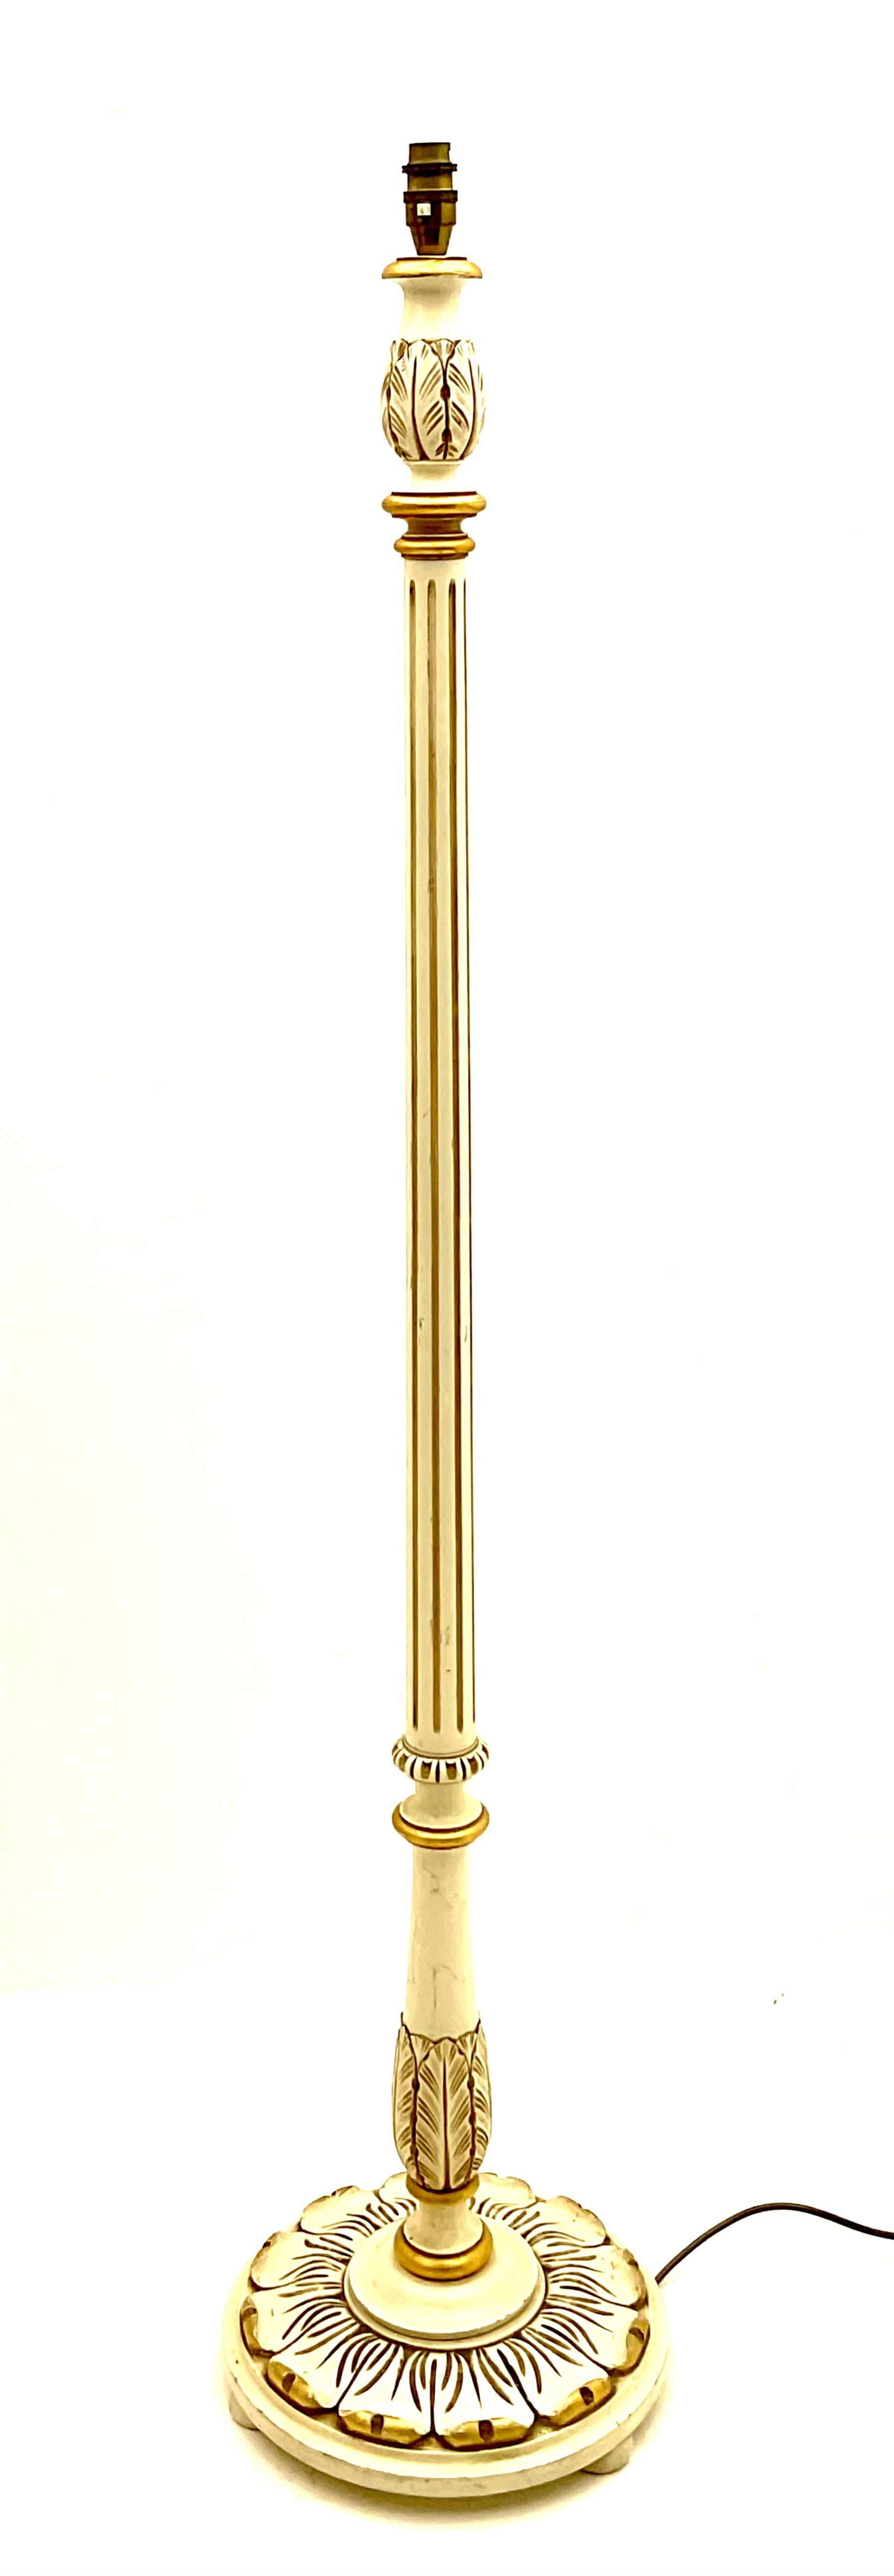 Late 20th century cream and gilt standard lamp